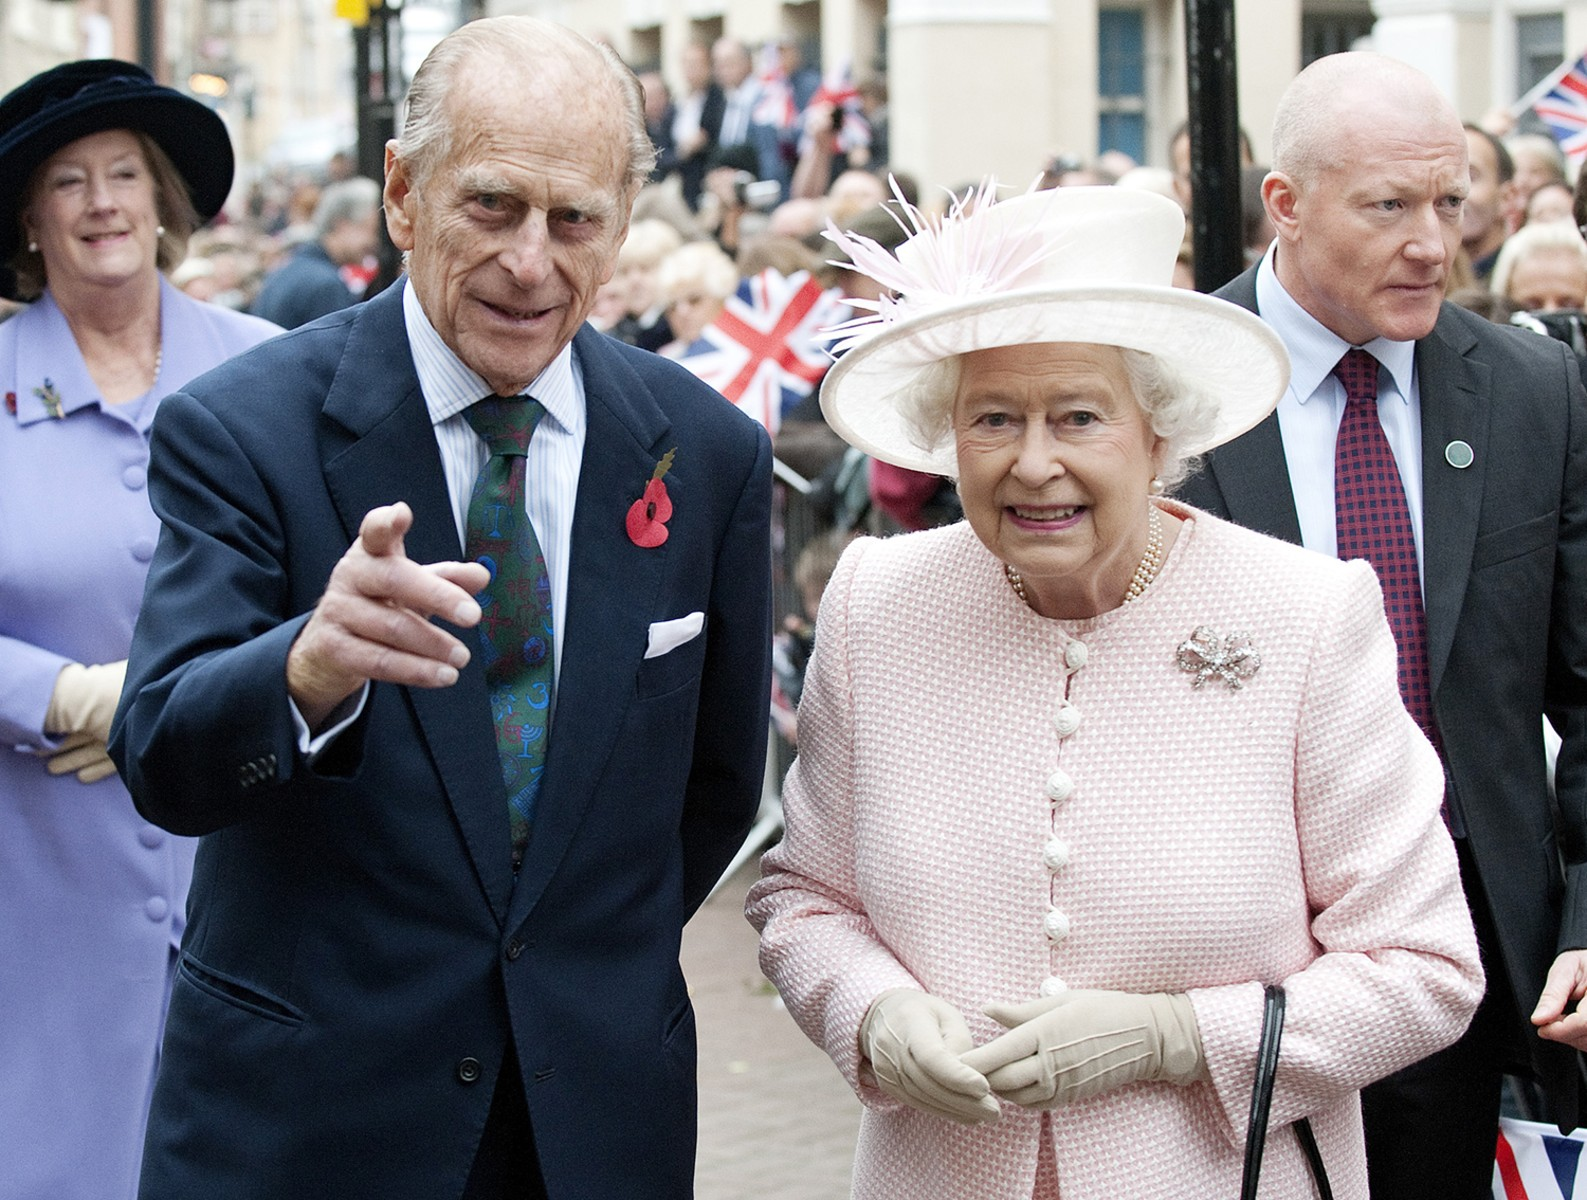 Prince Philip - Age, Health & Siblings - Biography